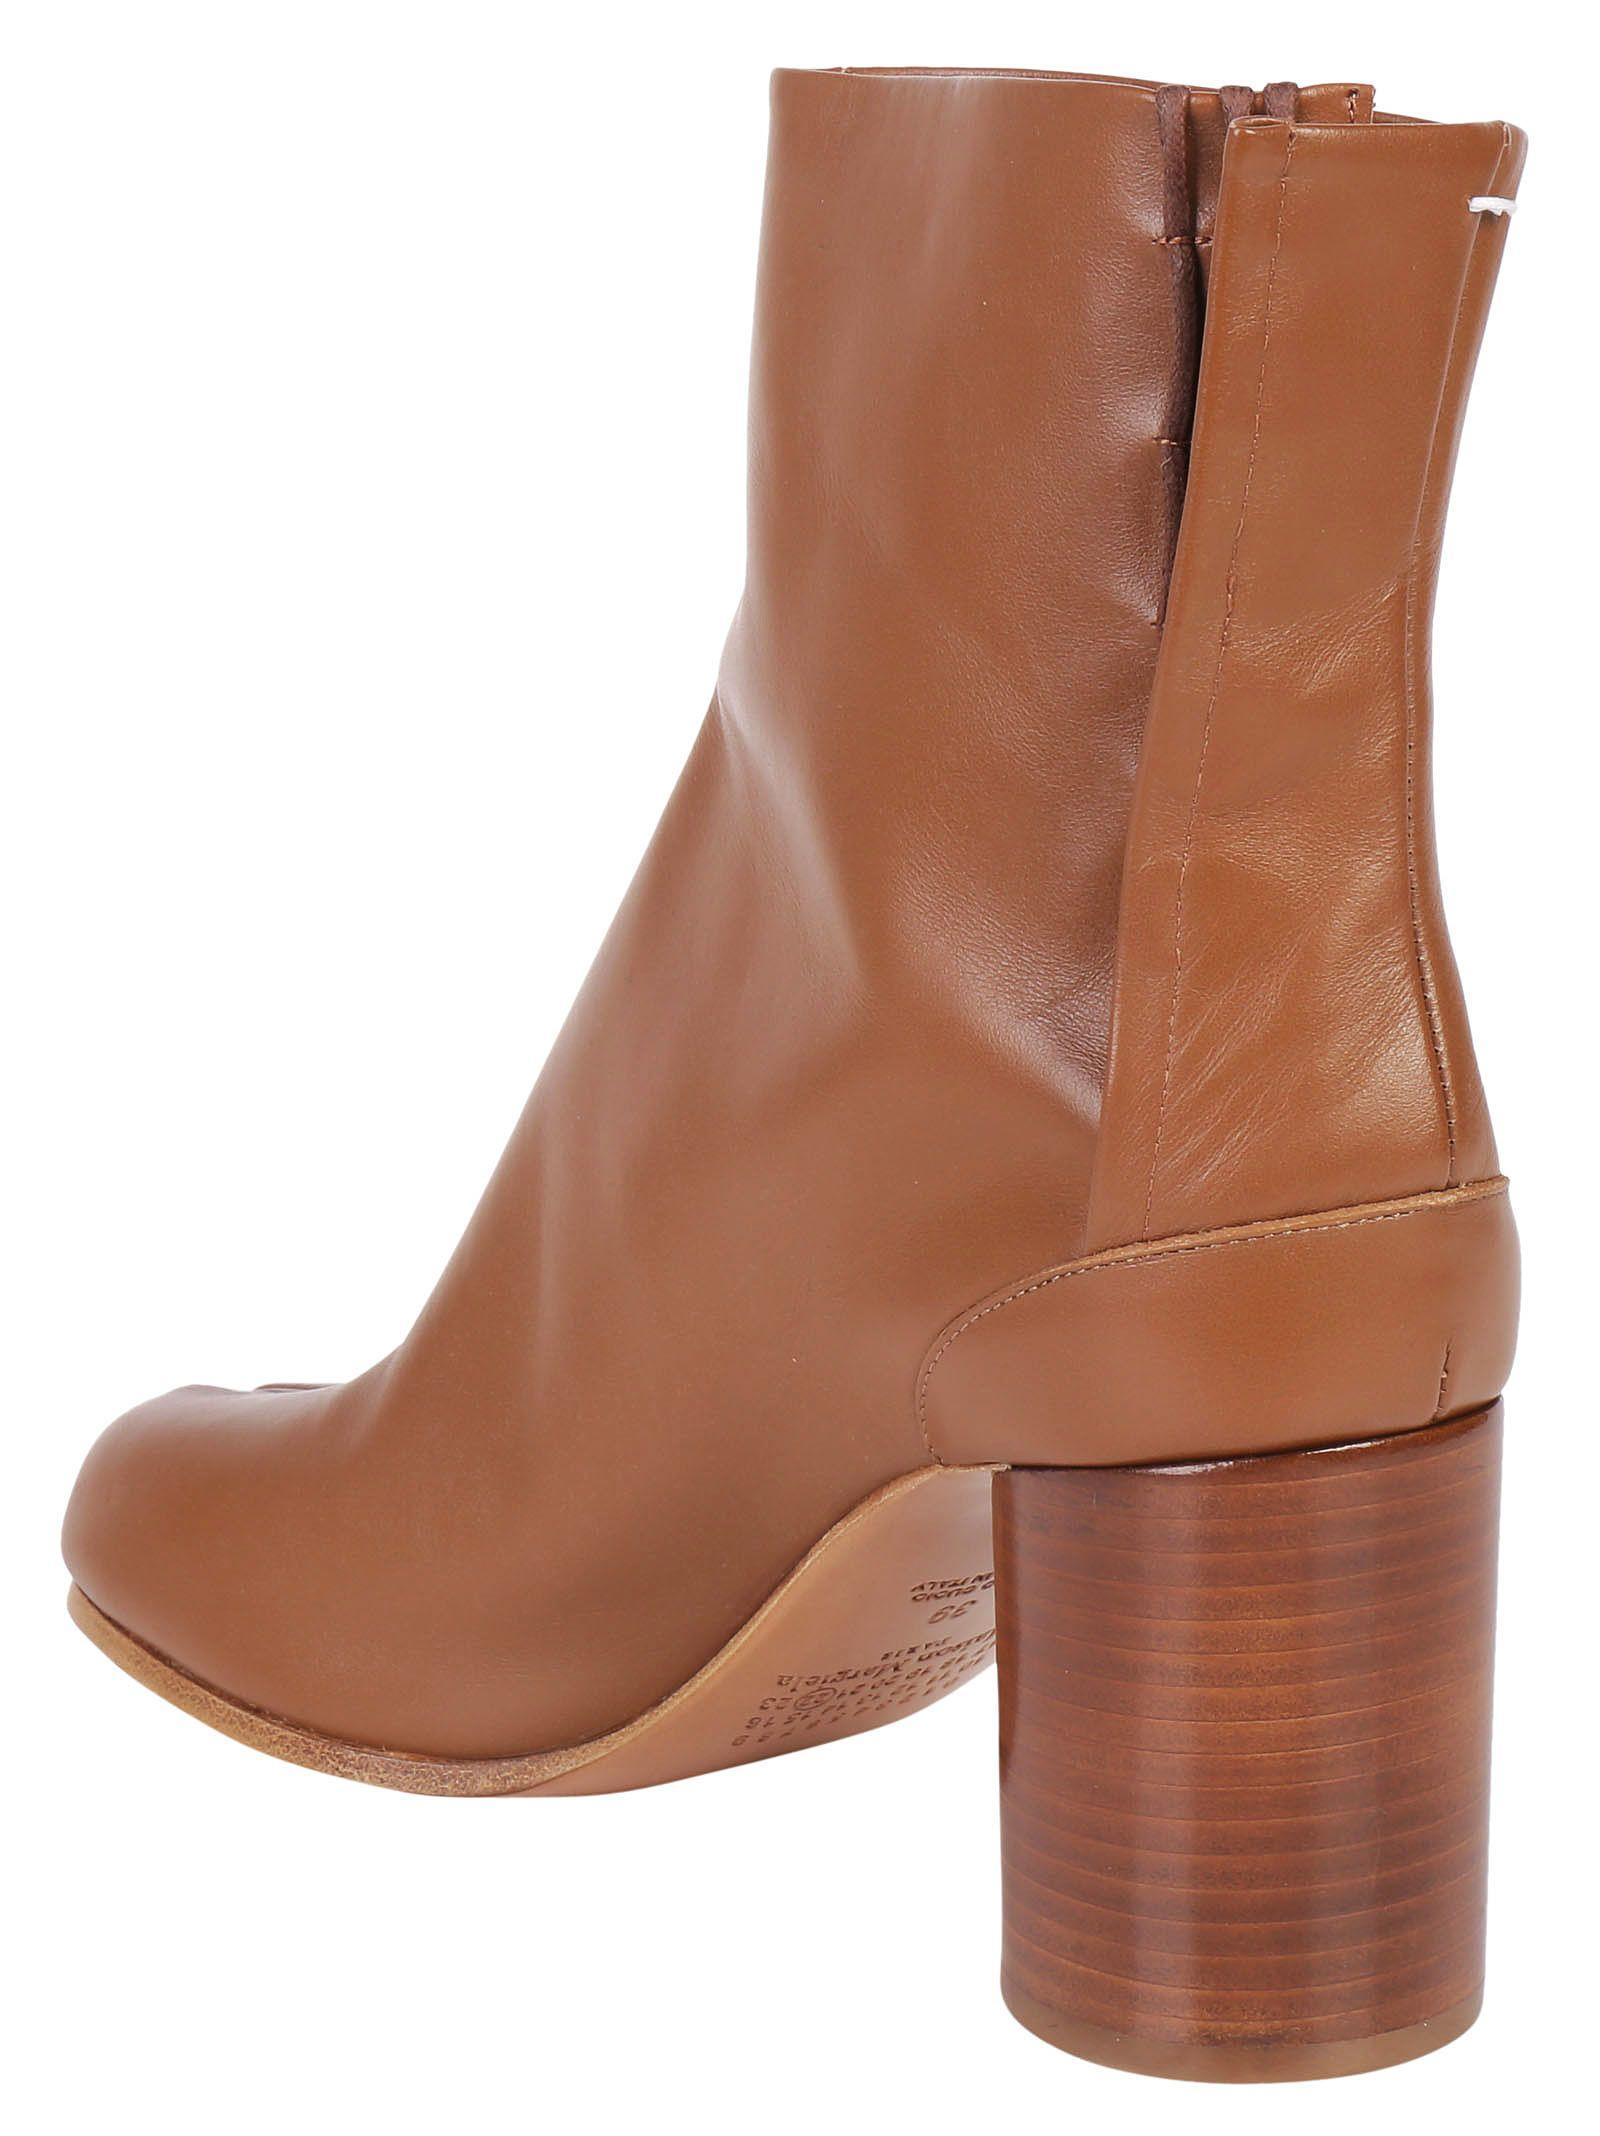 Beige Leather Tabi Boots Maison Martin Margiela 8SgTUjL